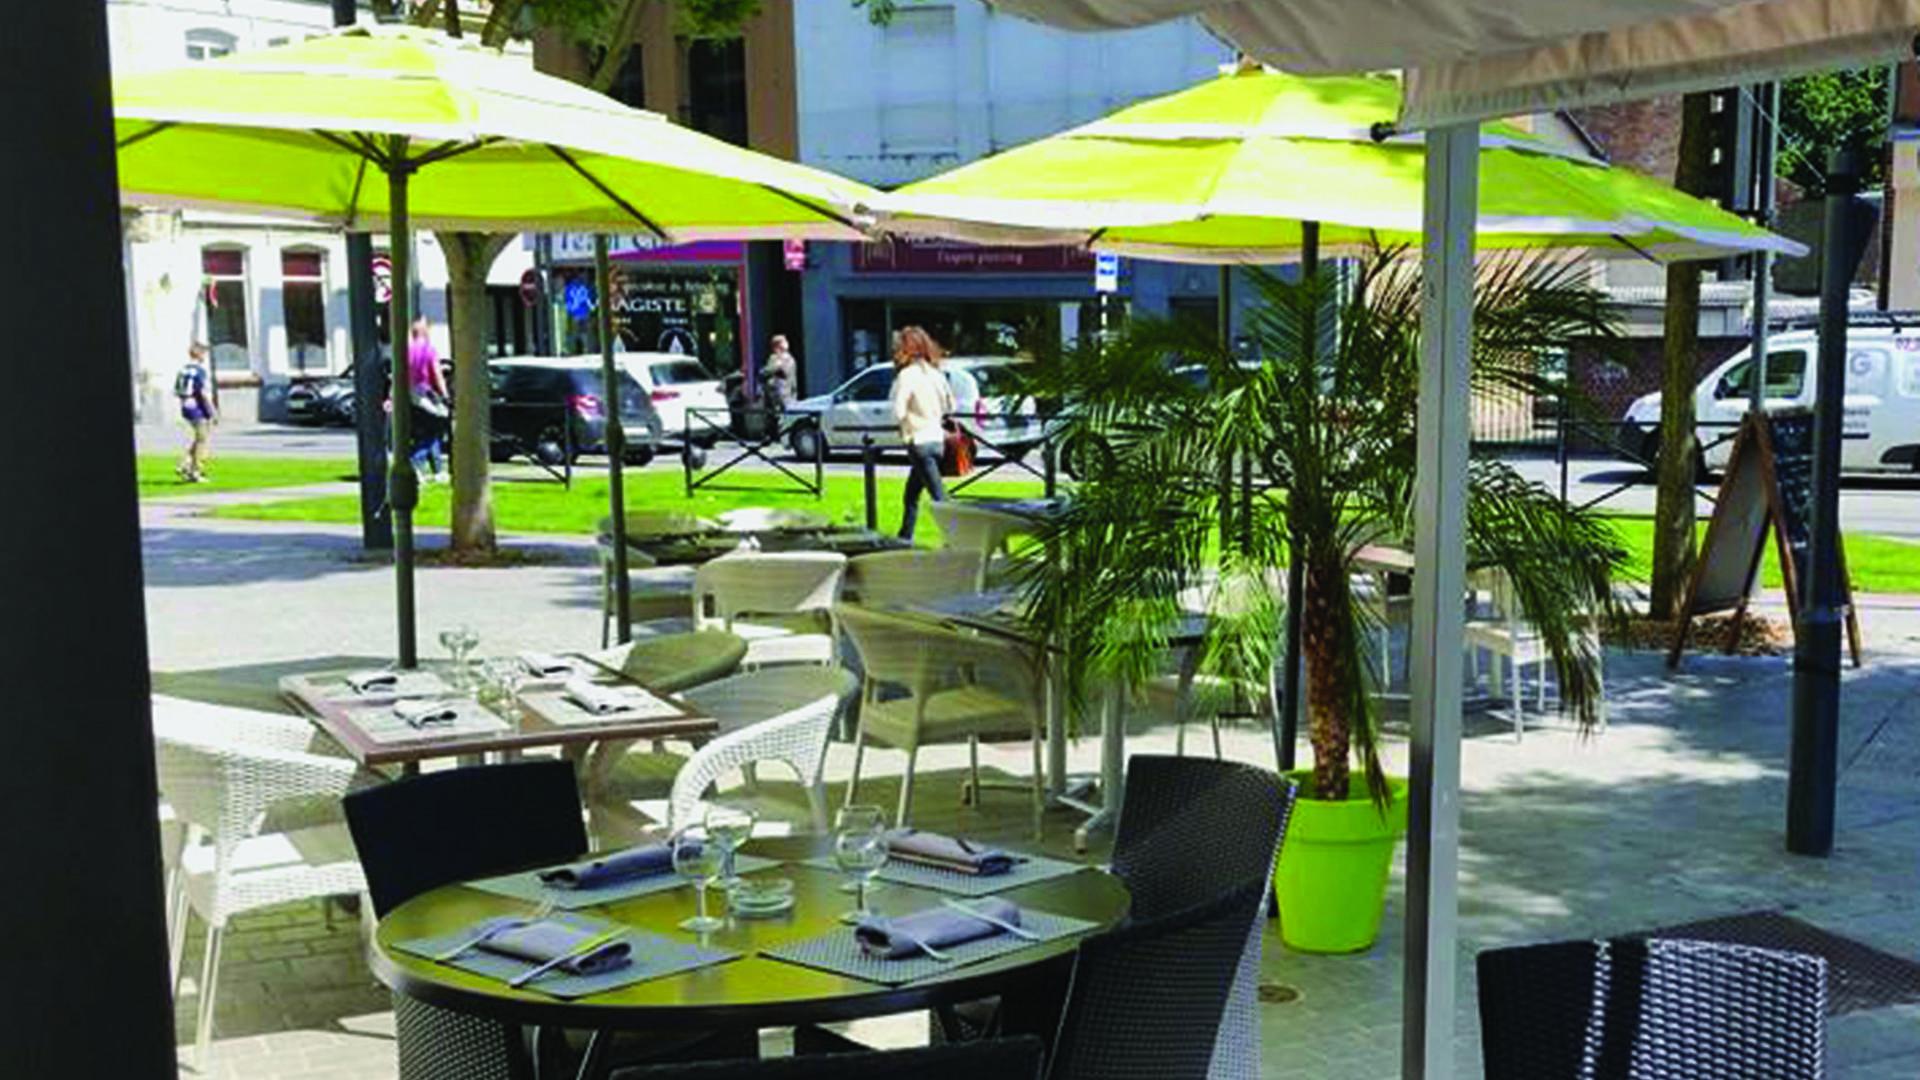 Valenciennes, les Arcades, la terrasse